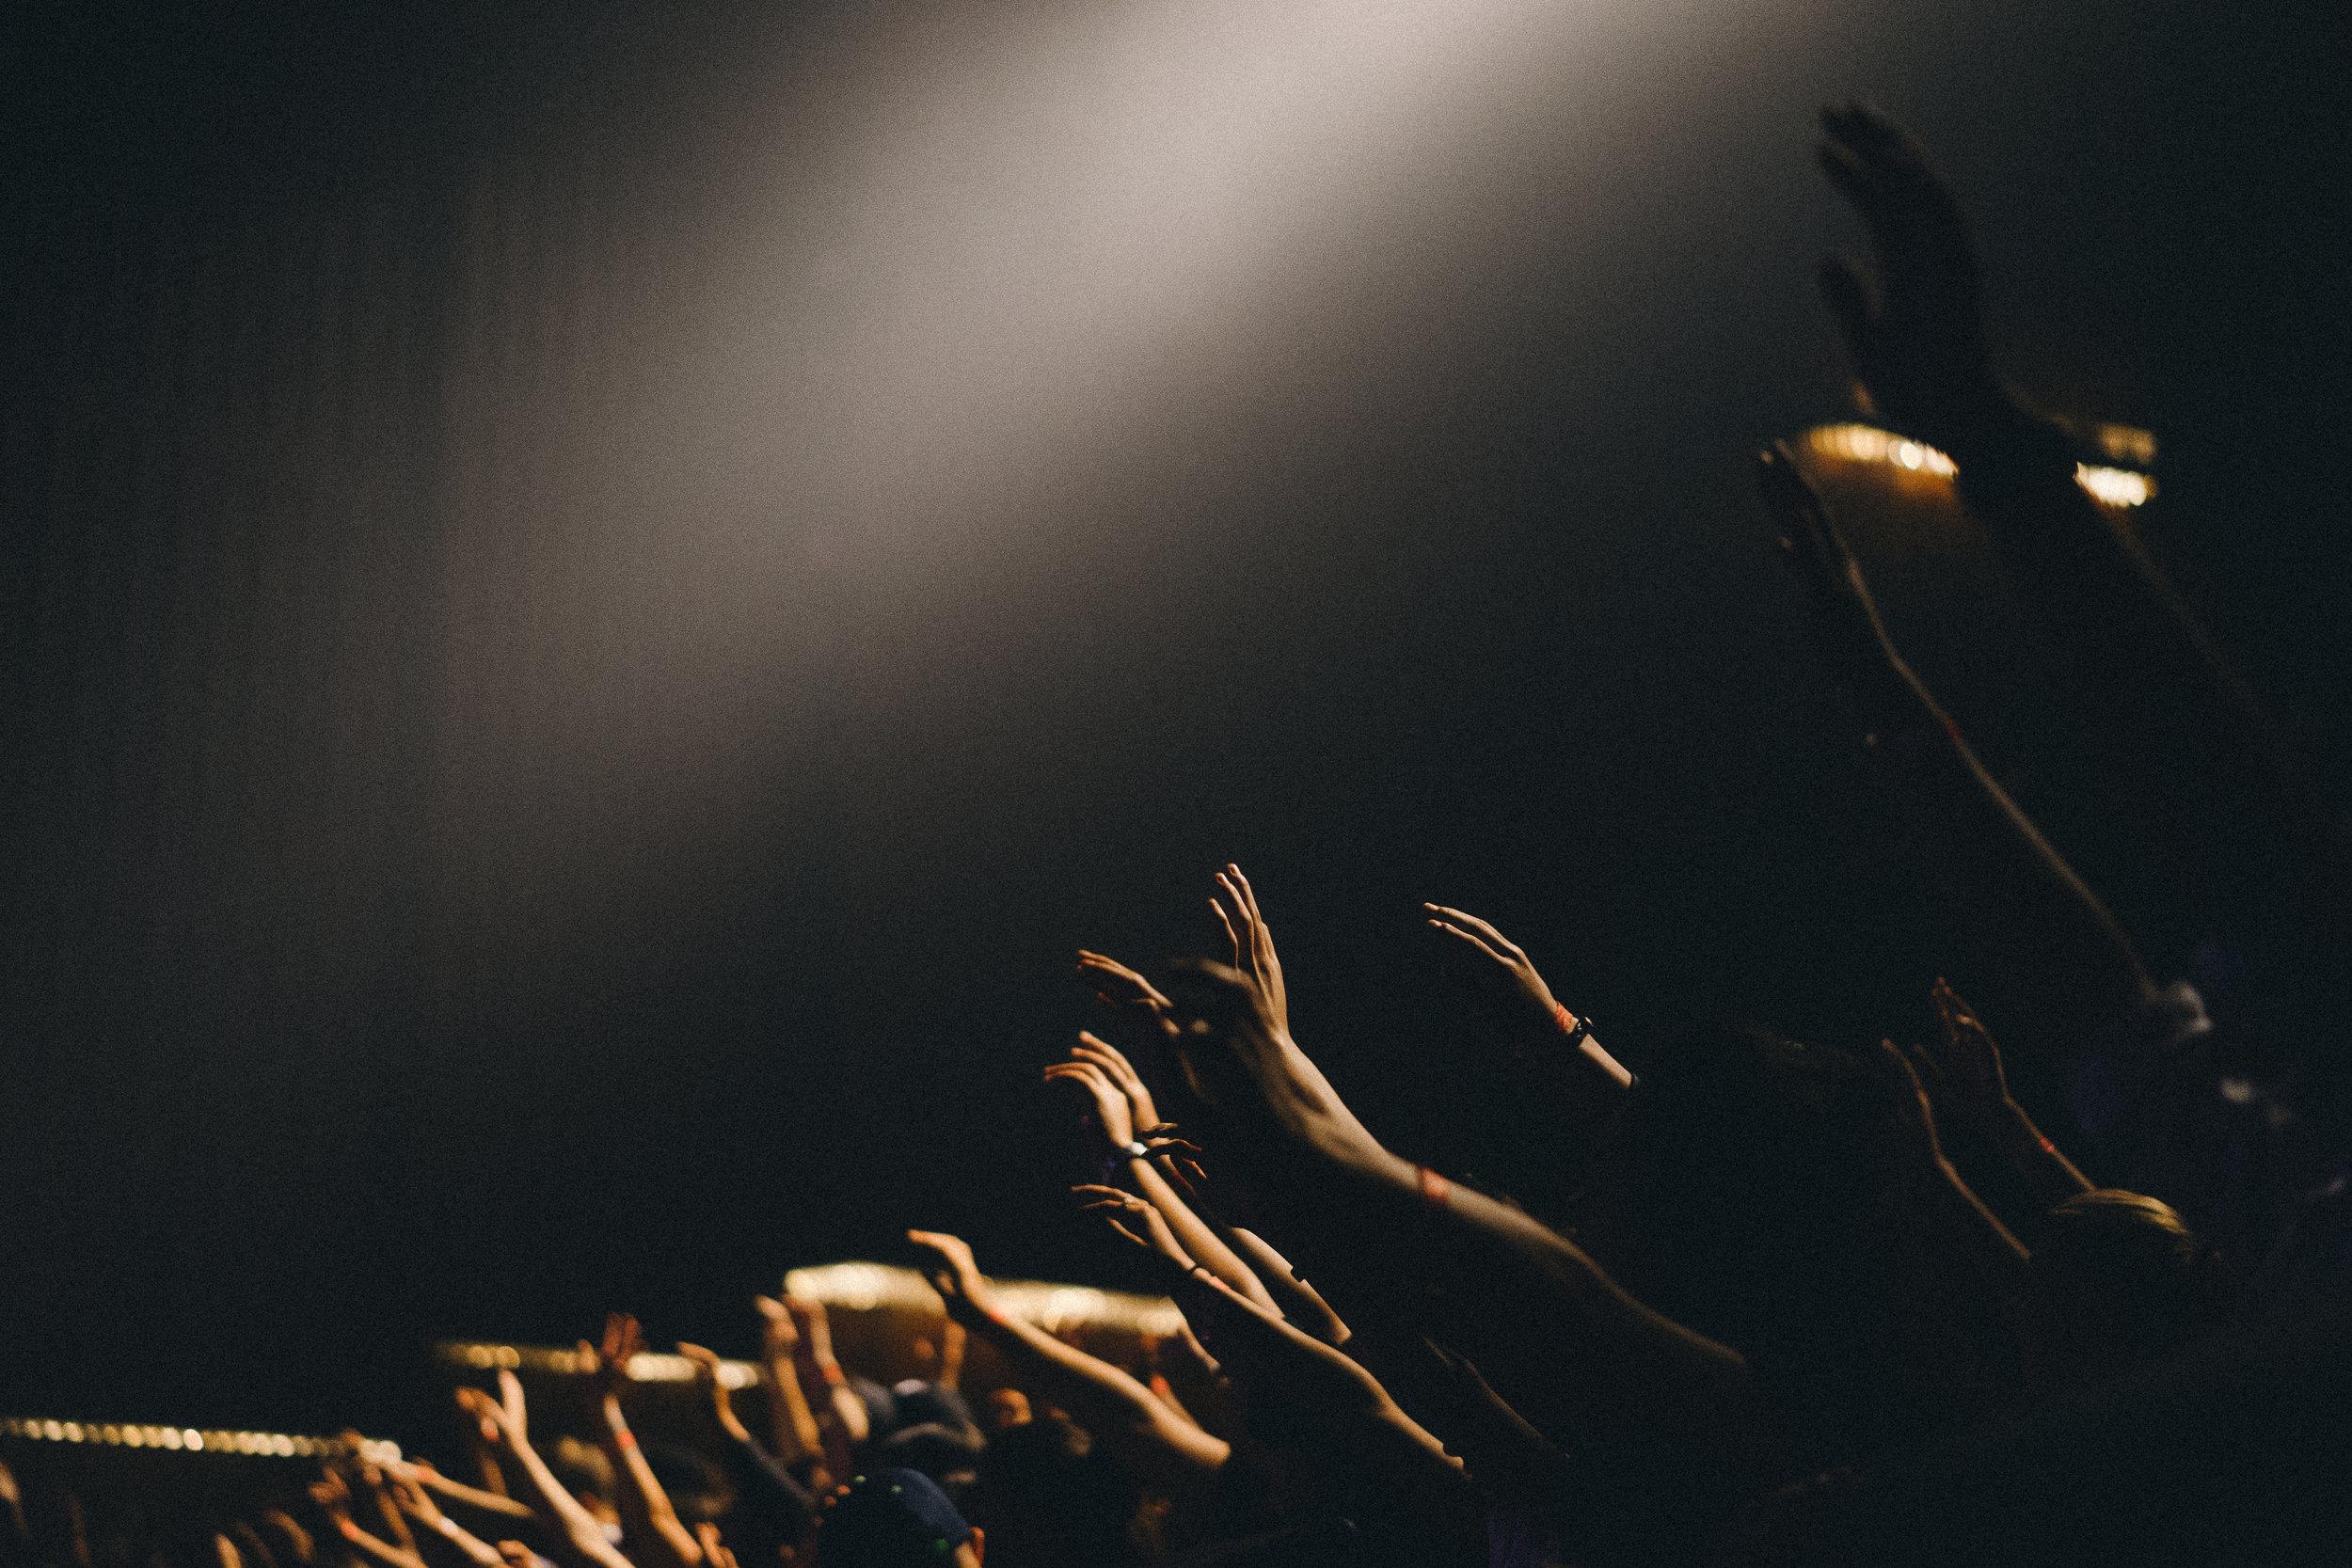 Selfless Worship - by Joshua Kyle Dunn